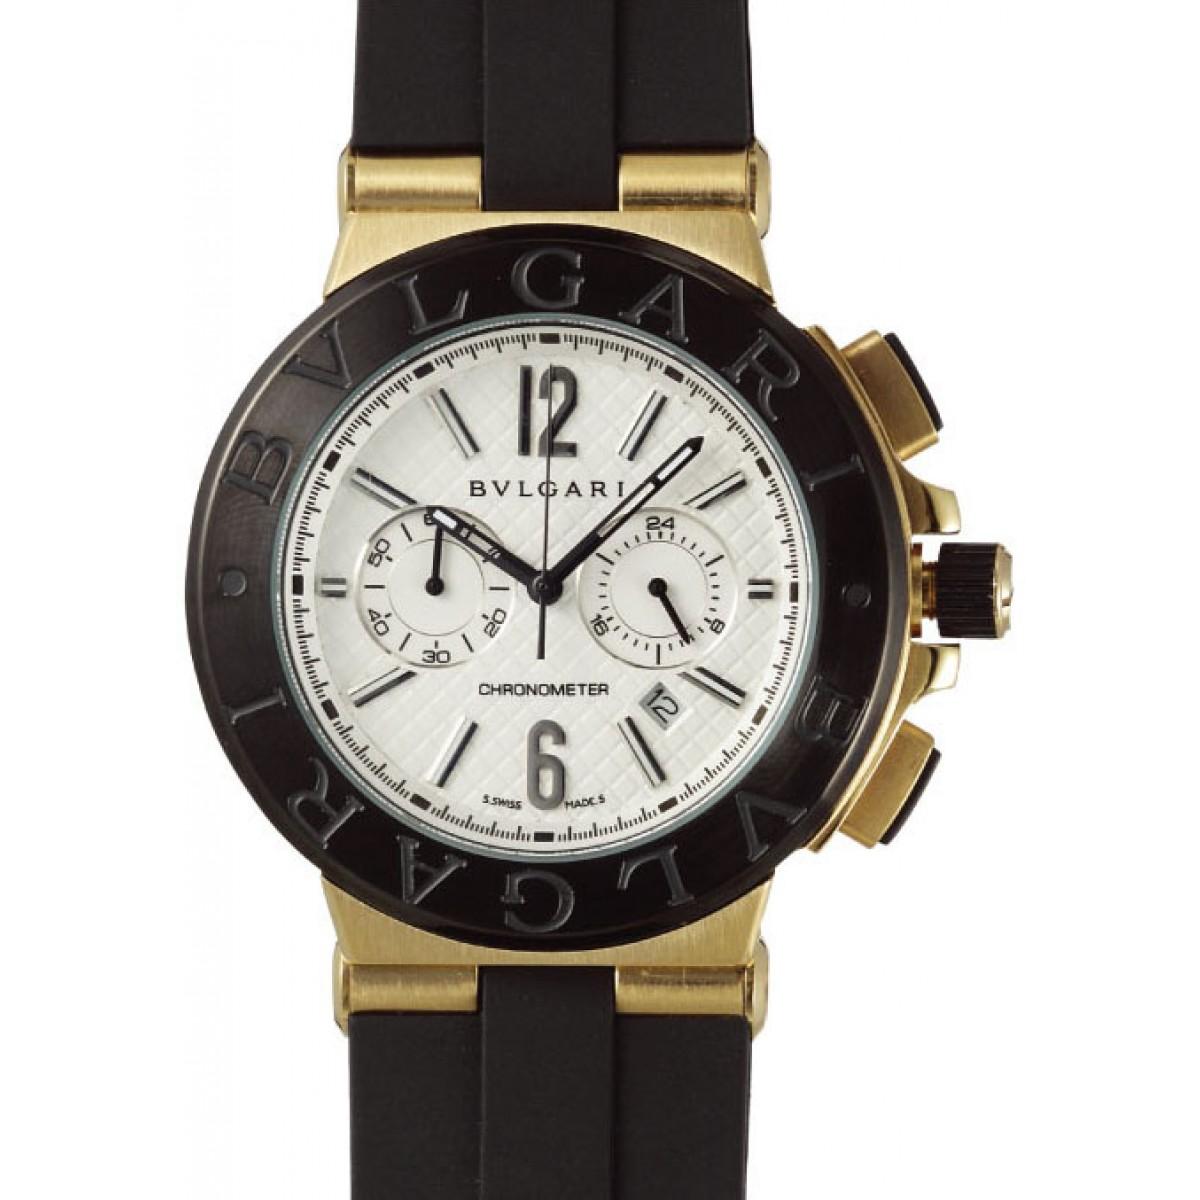 ef78163f109 Espiar · Relógio Réplica Bulgari Titanium Dourado